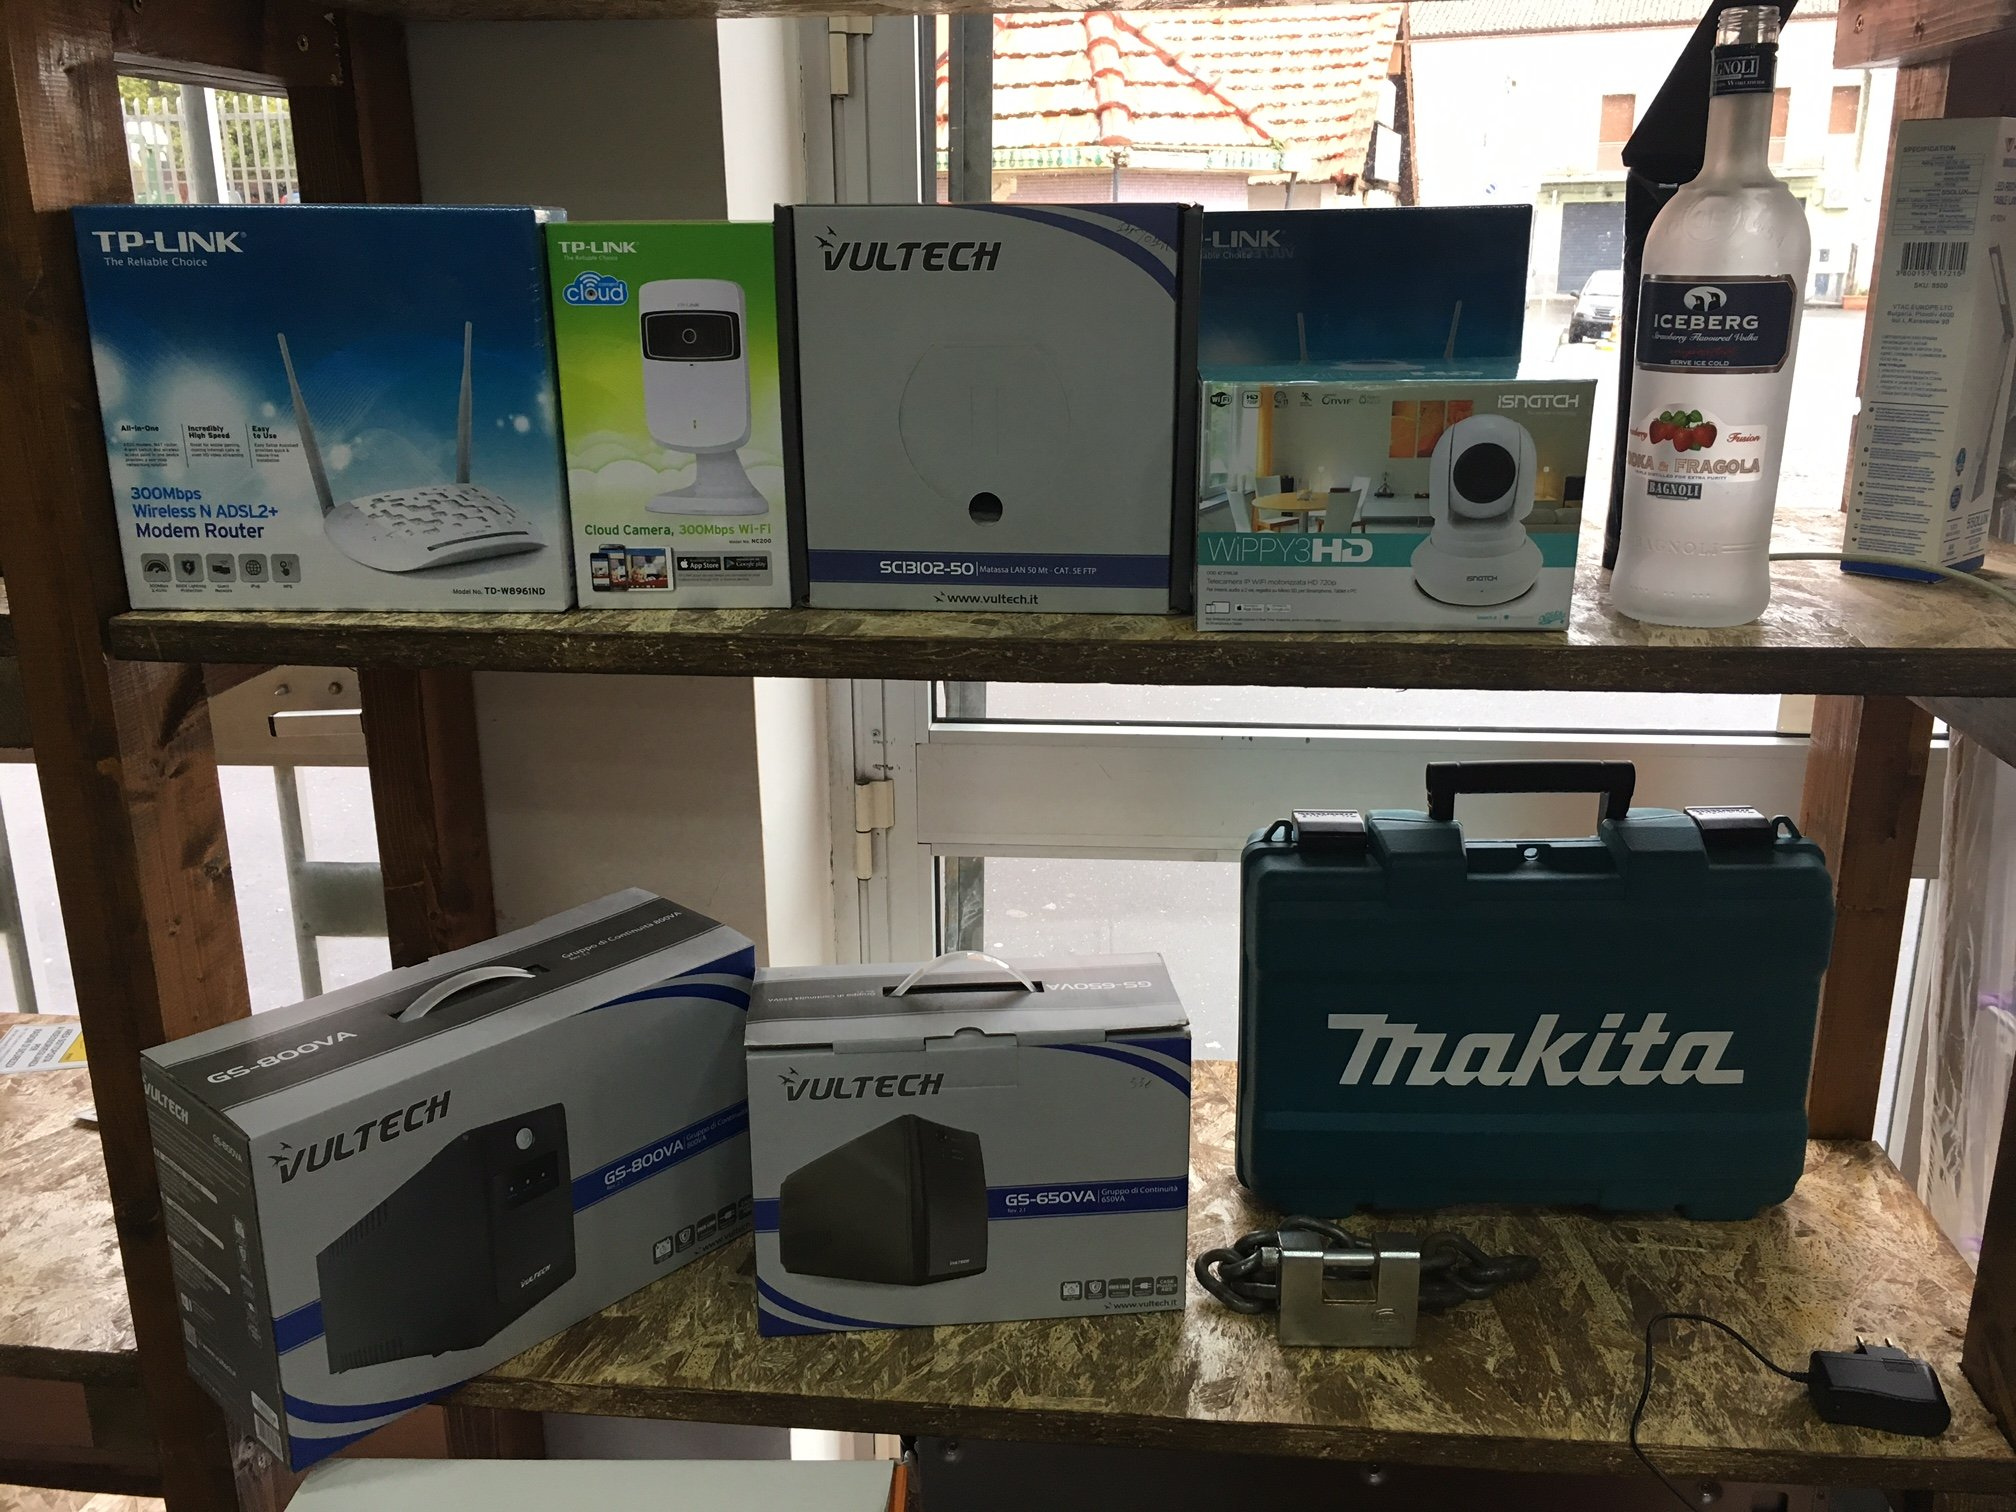 modem, videocamere e gruppi di continuita' in uno scaffale